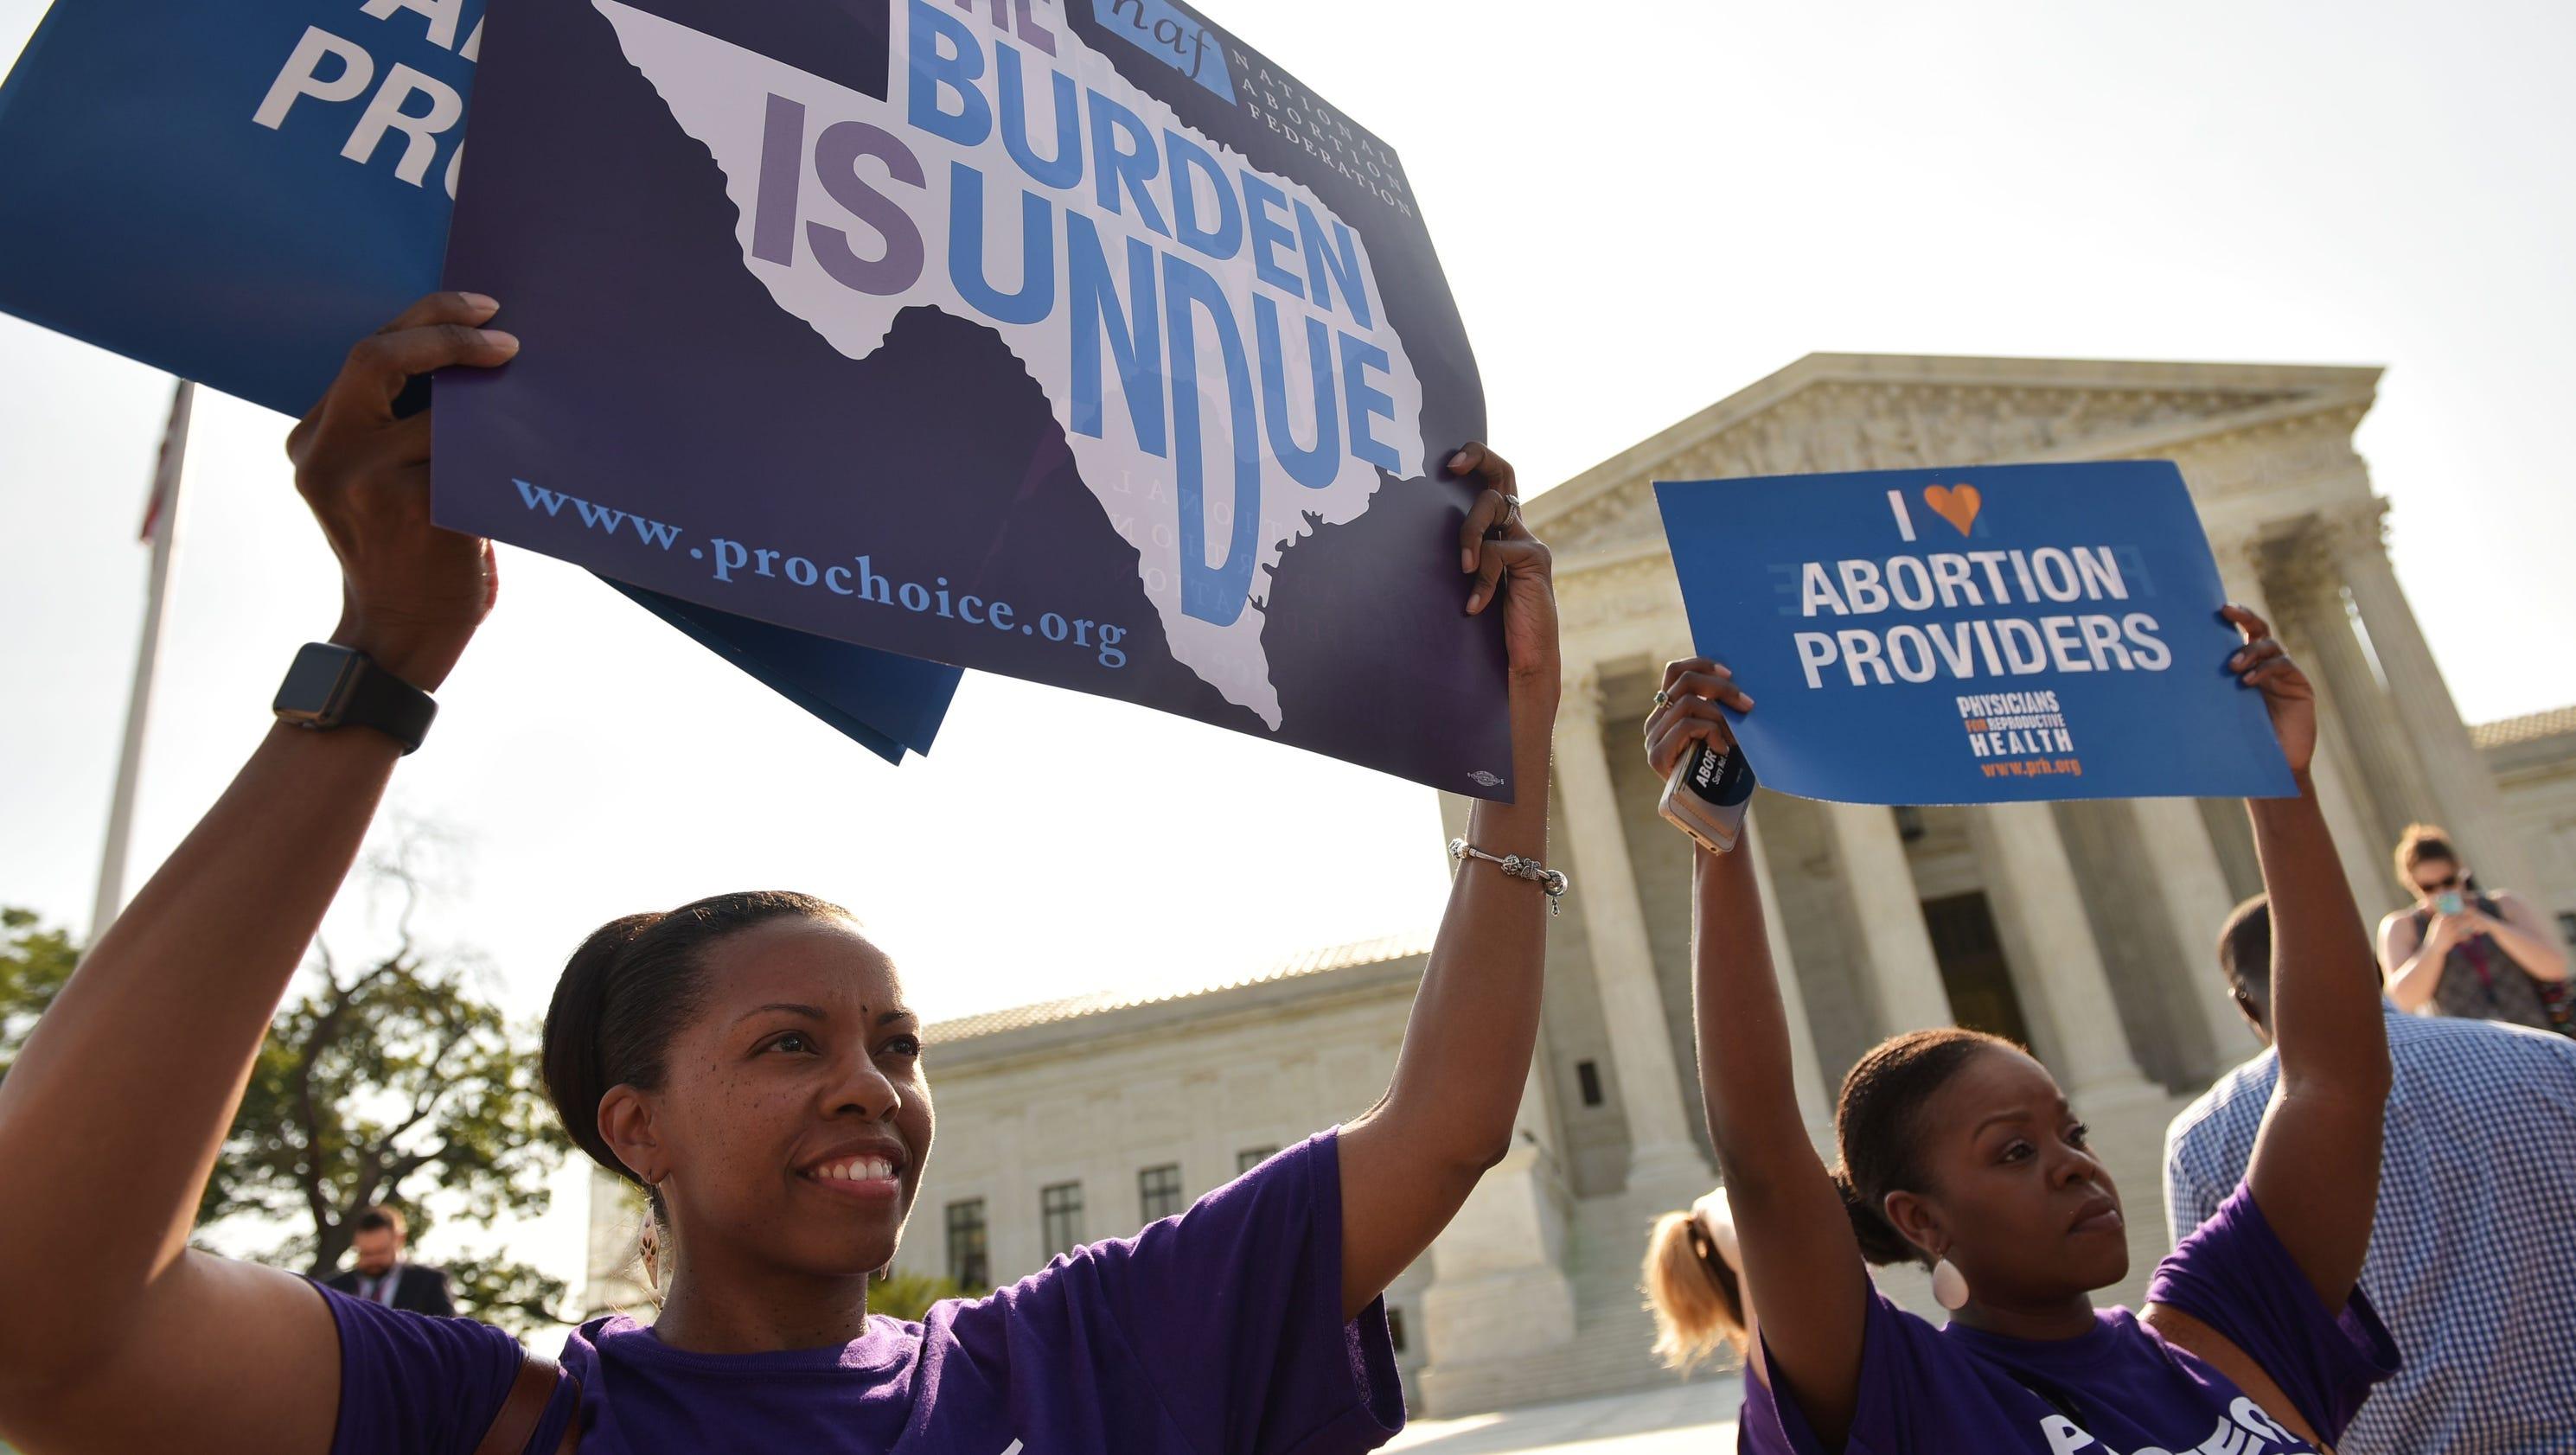 Supreme Court strikes down abortion restrictions